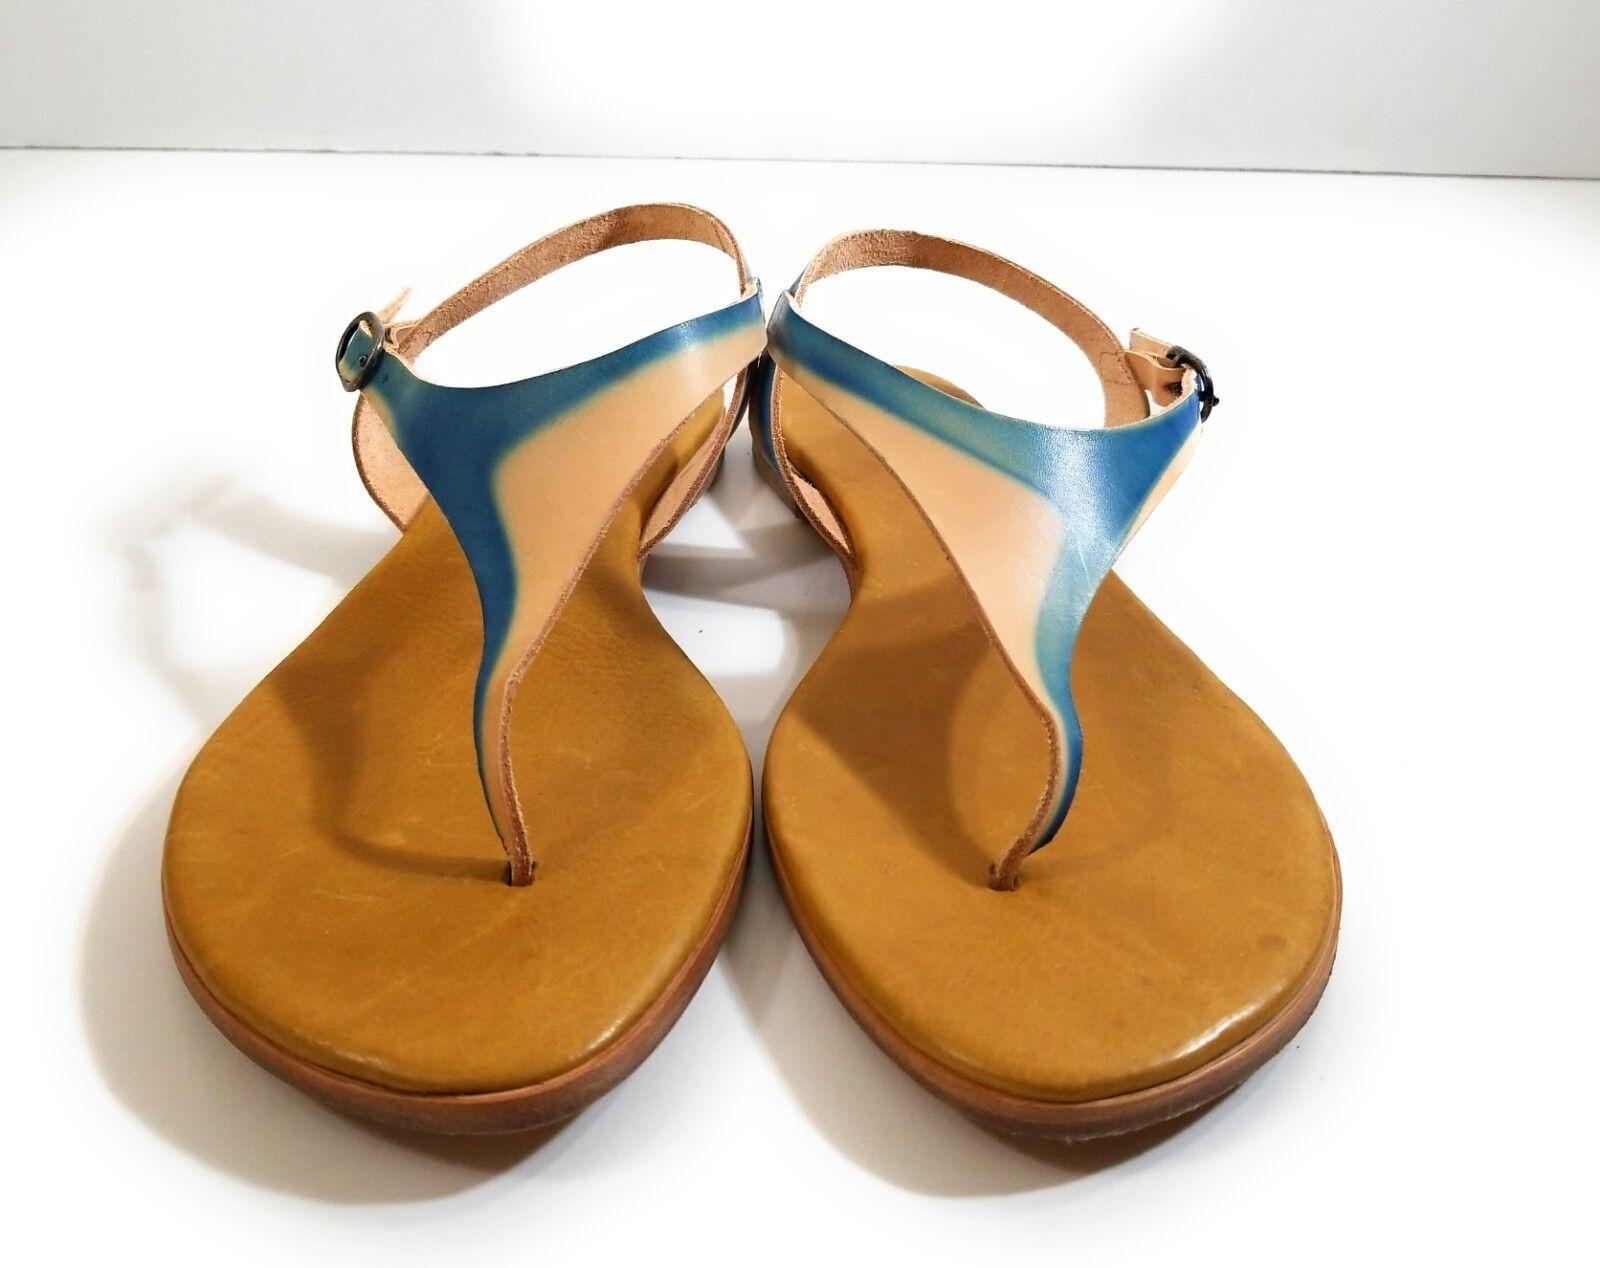 New Coclico donna blu Marronee Leather Flats Ankle Strap Sandals Sandals Sandals Thong scarpe Sz 40 36709e